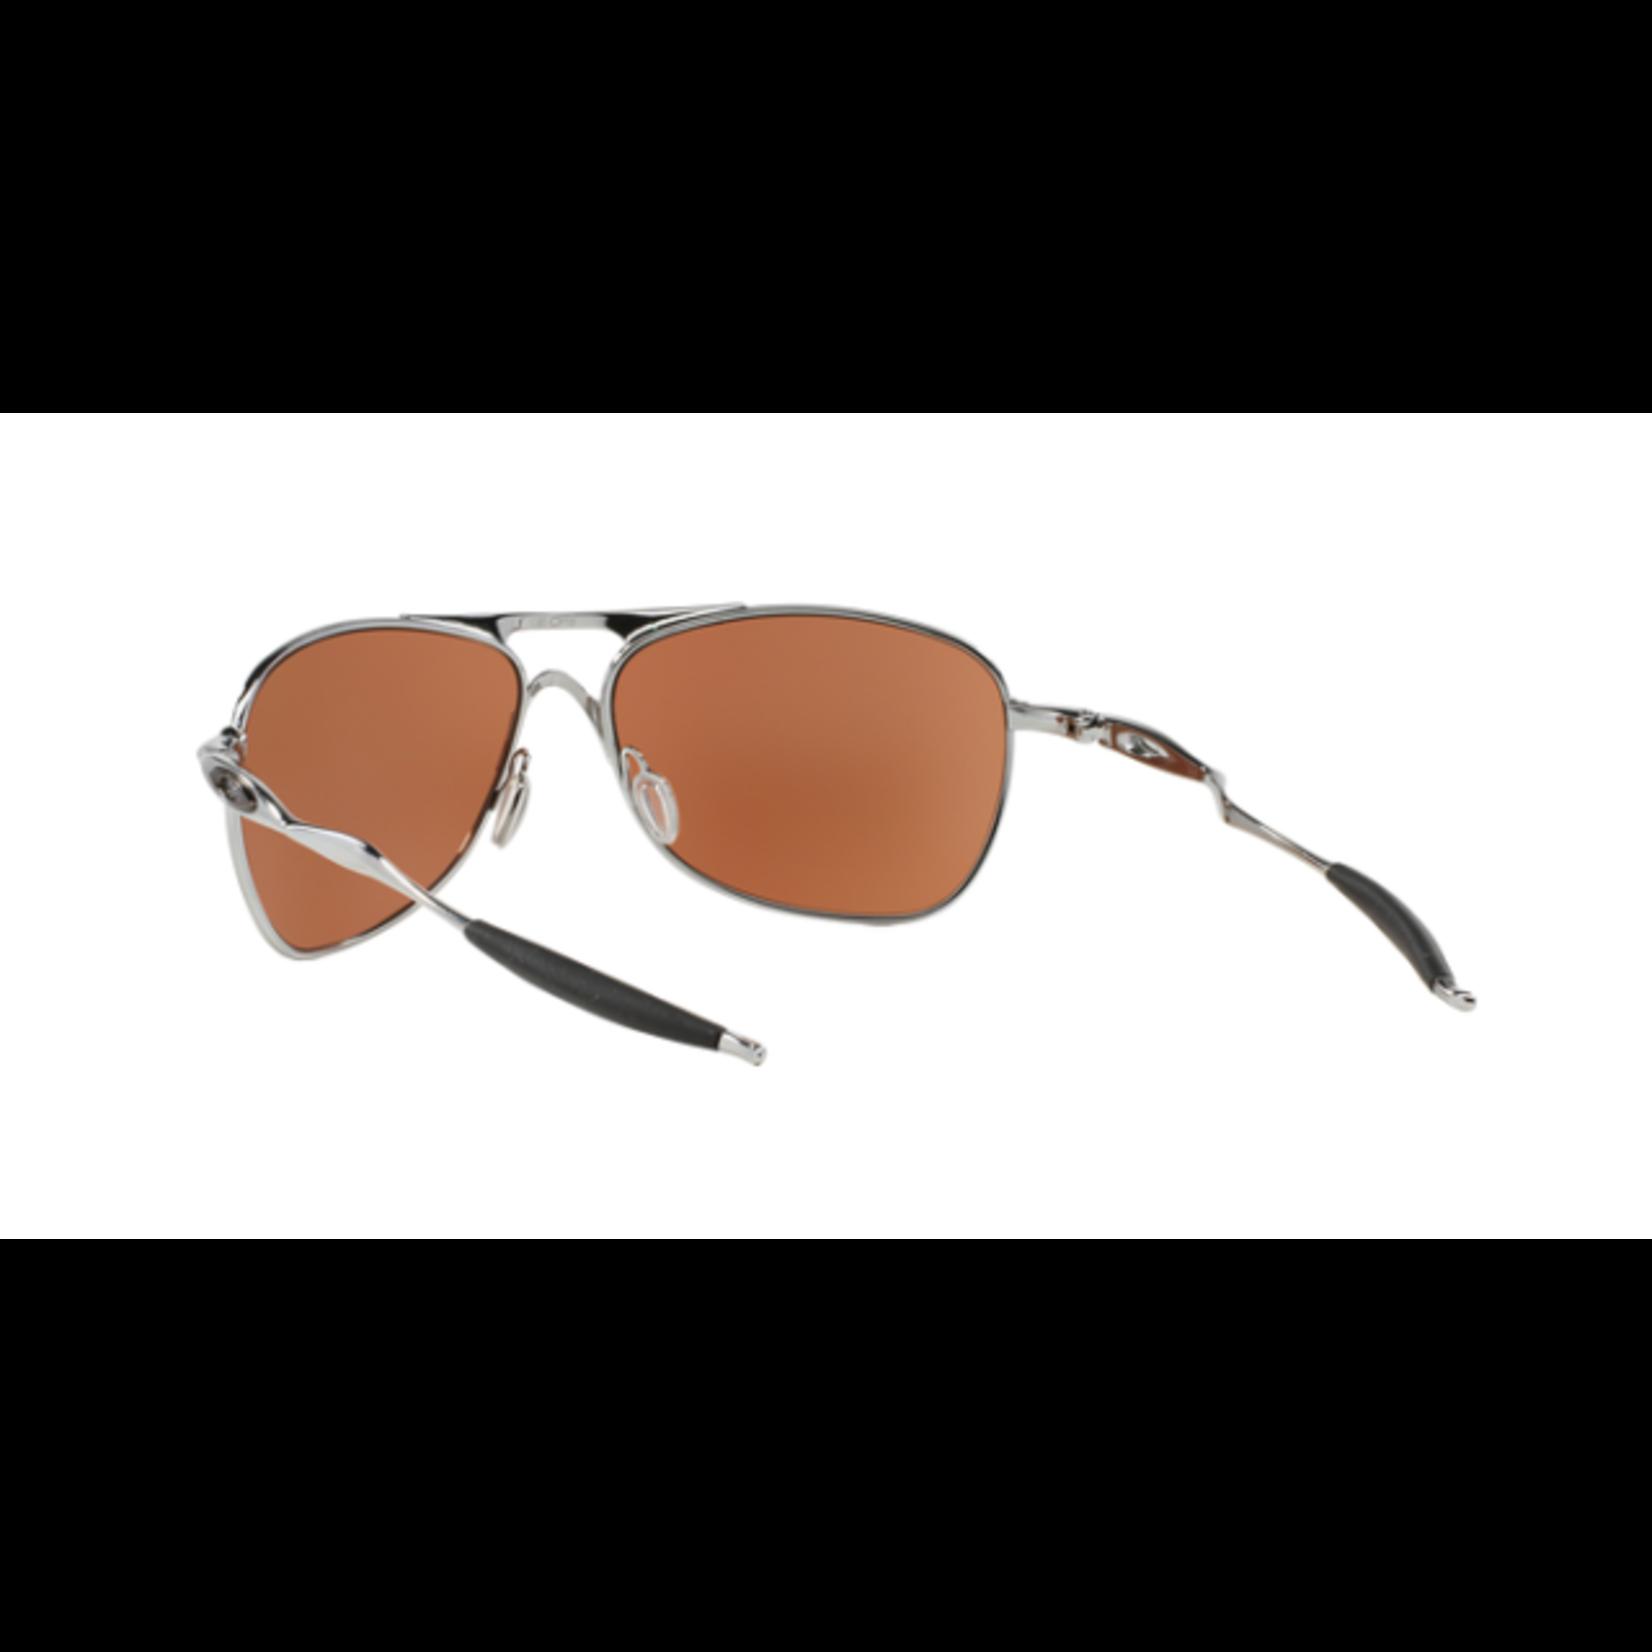 Oakley Oakley Men's Crosshair Chrome Sunglasses